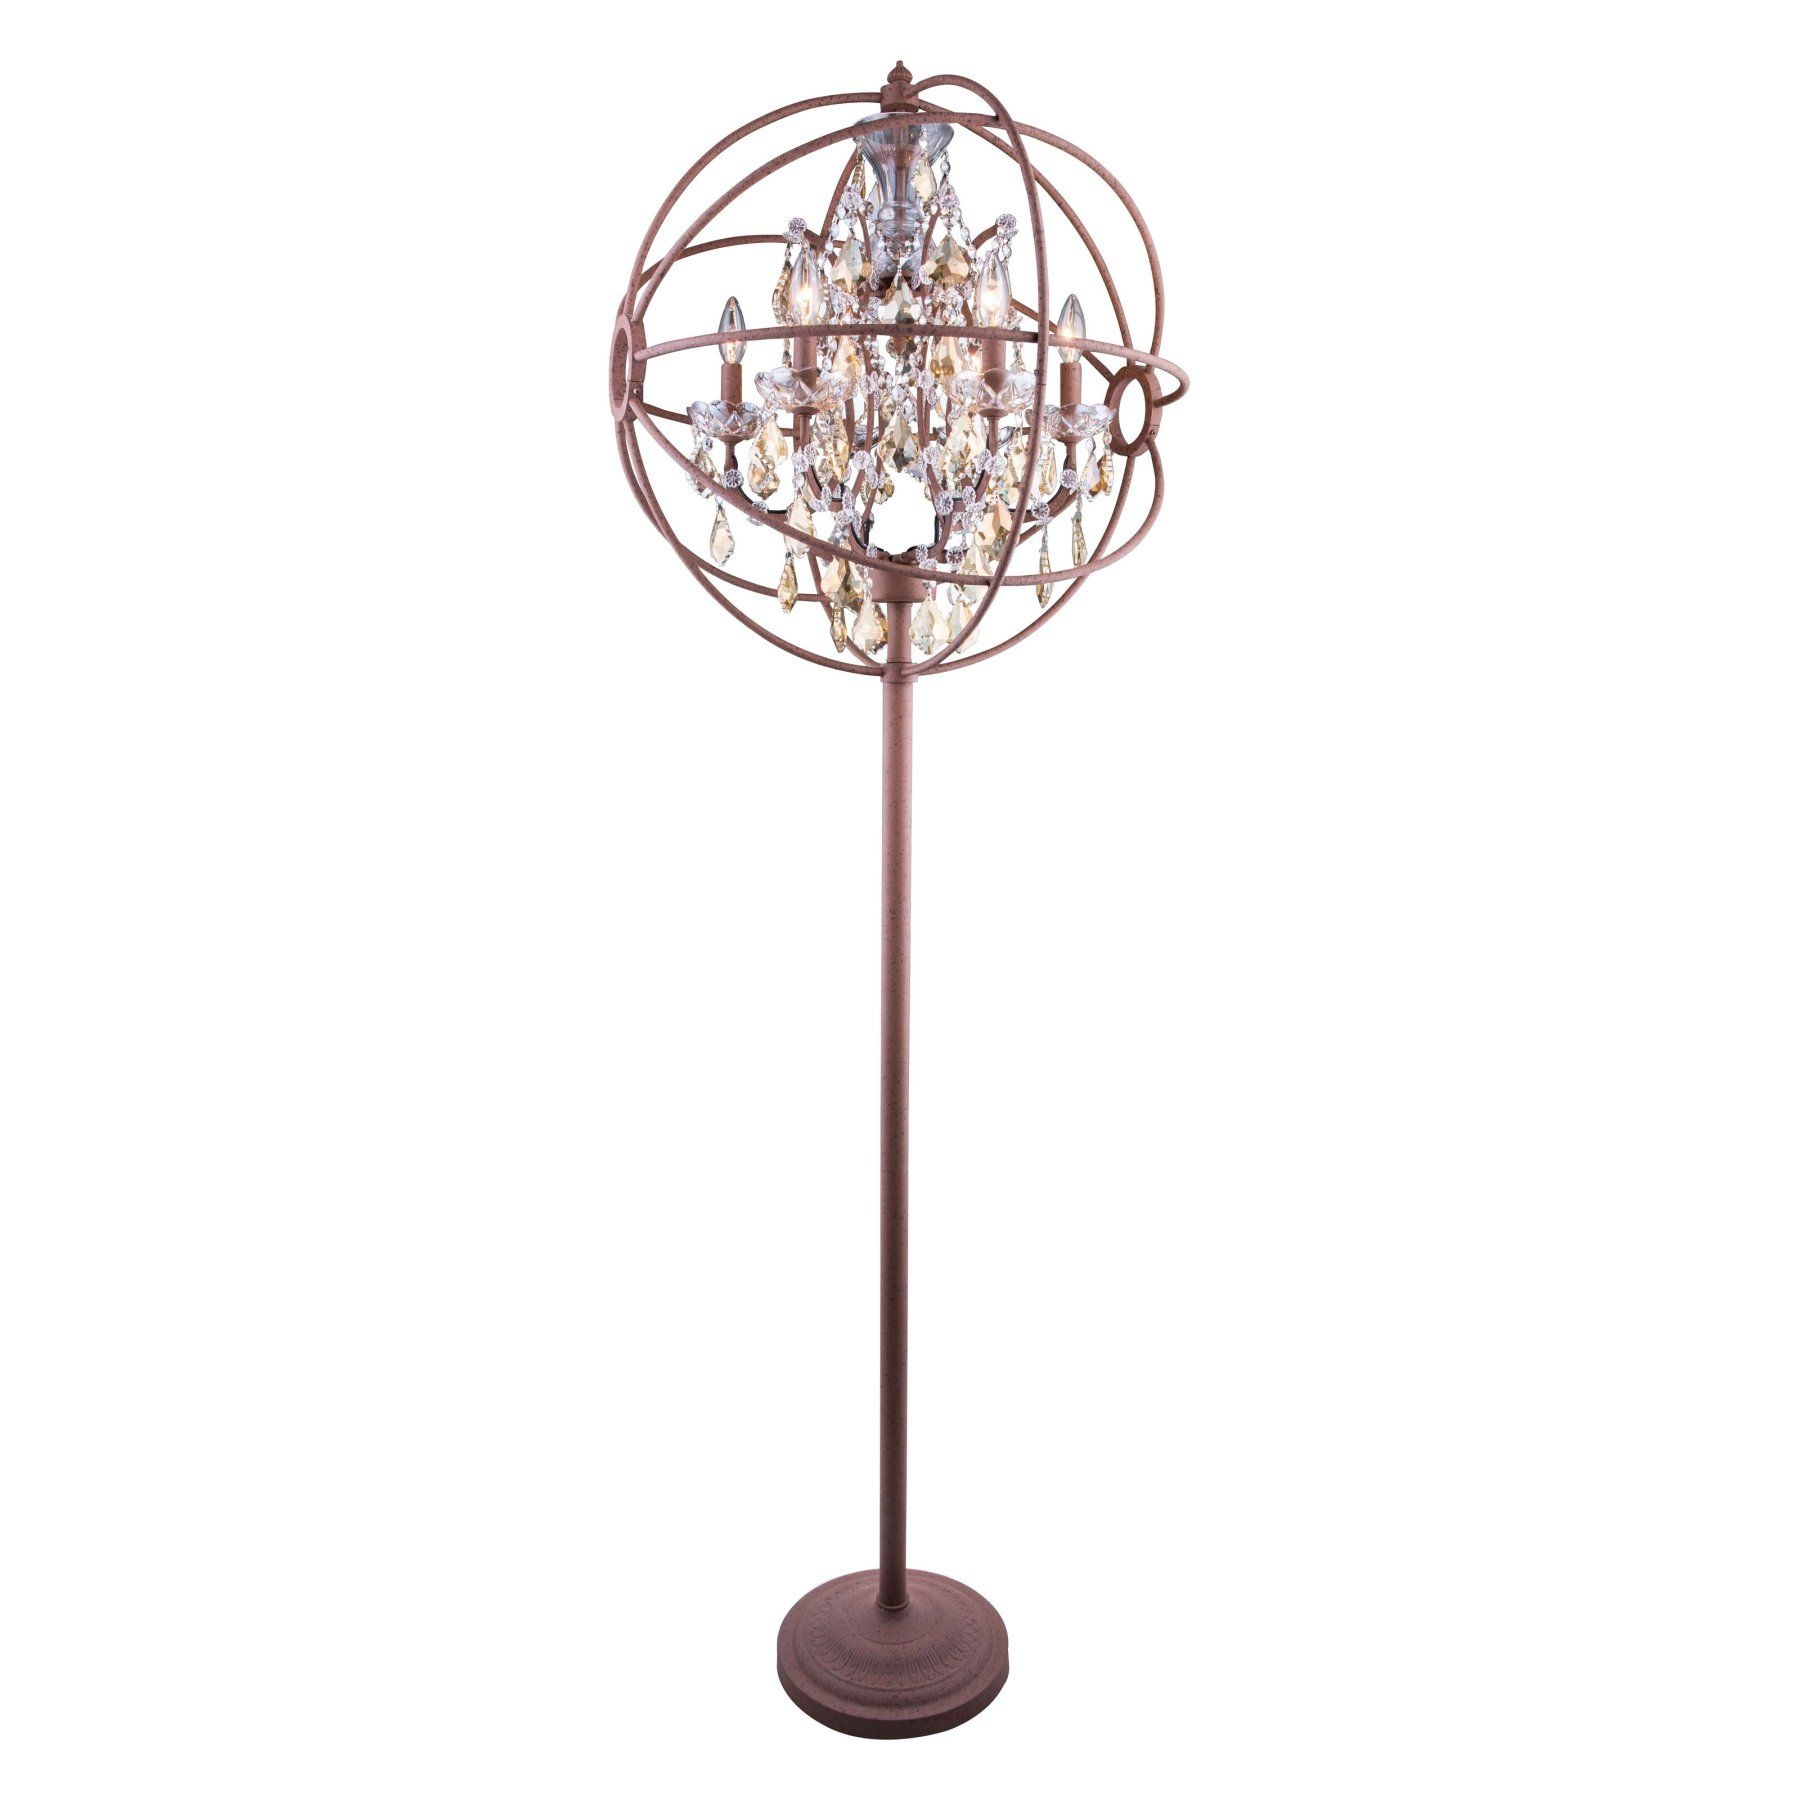 Elegant Lighting Geneva 1130 Floor Lamp 1130FL24PN RC